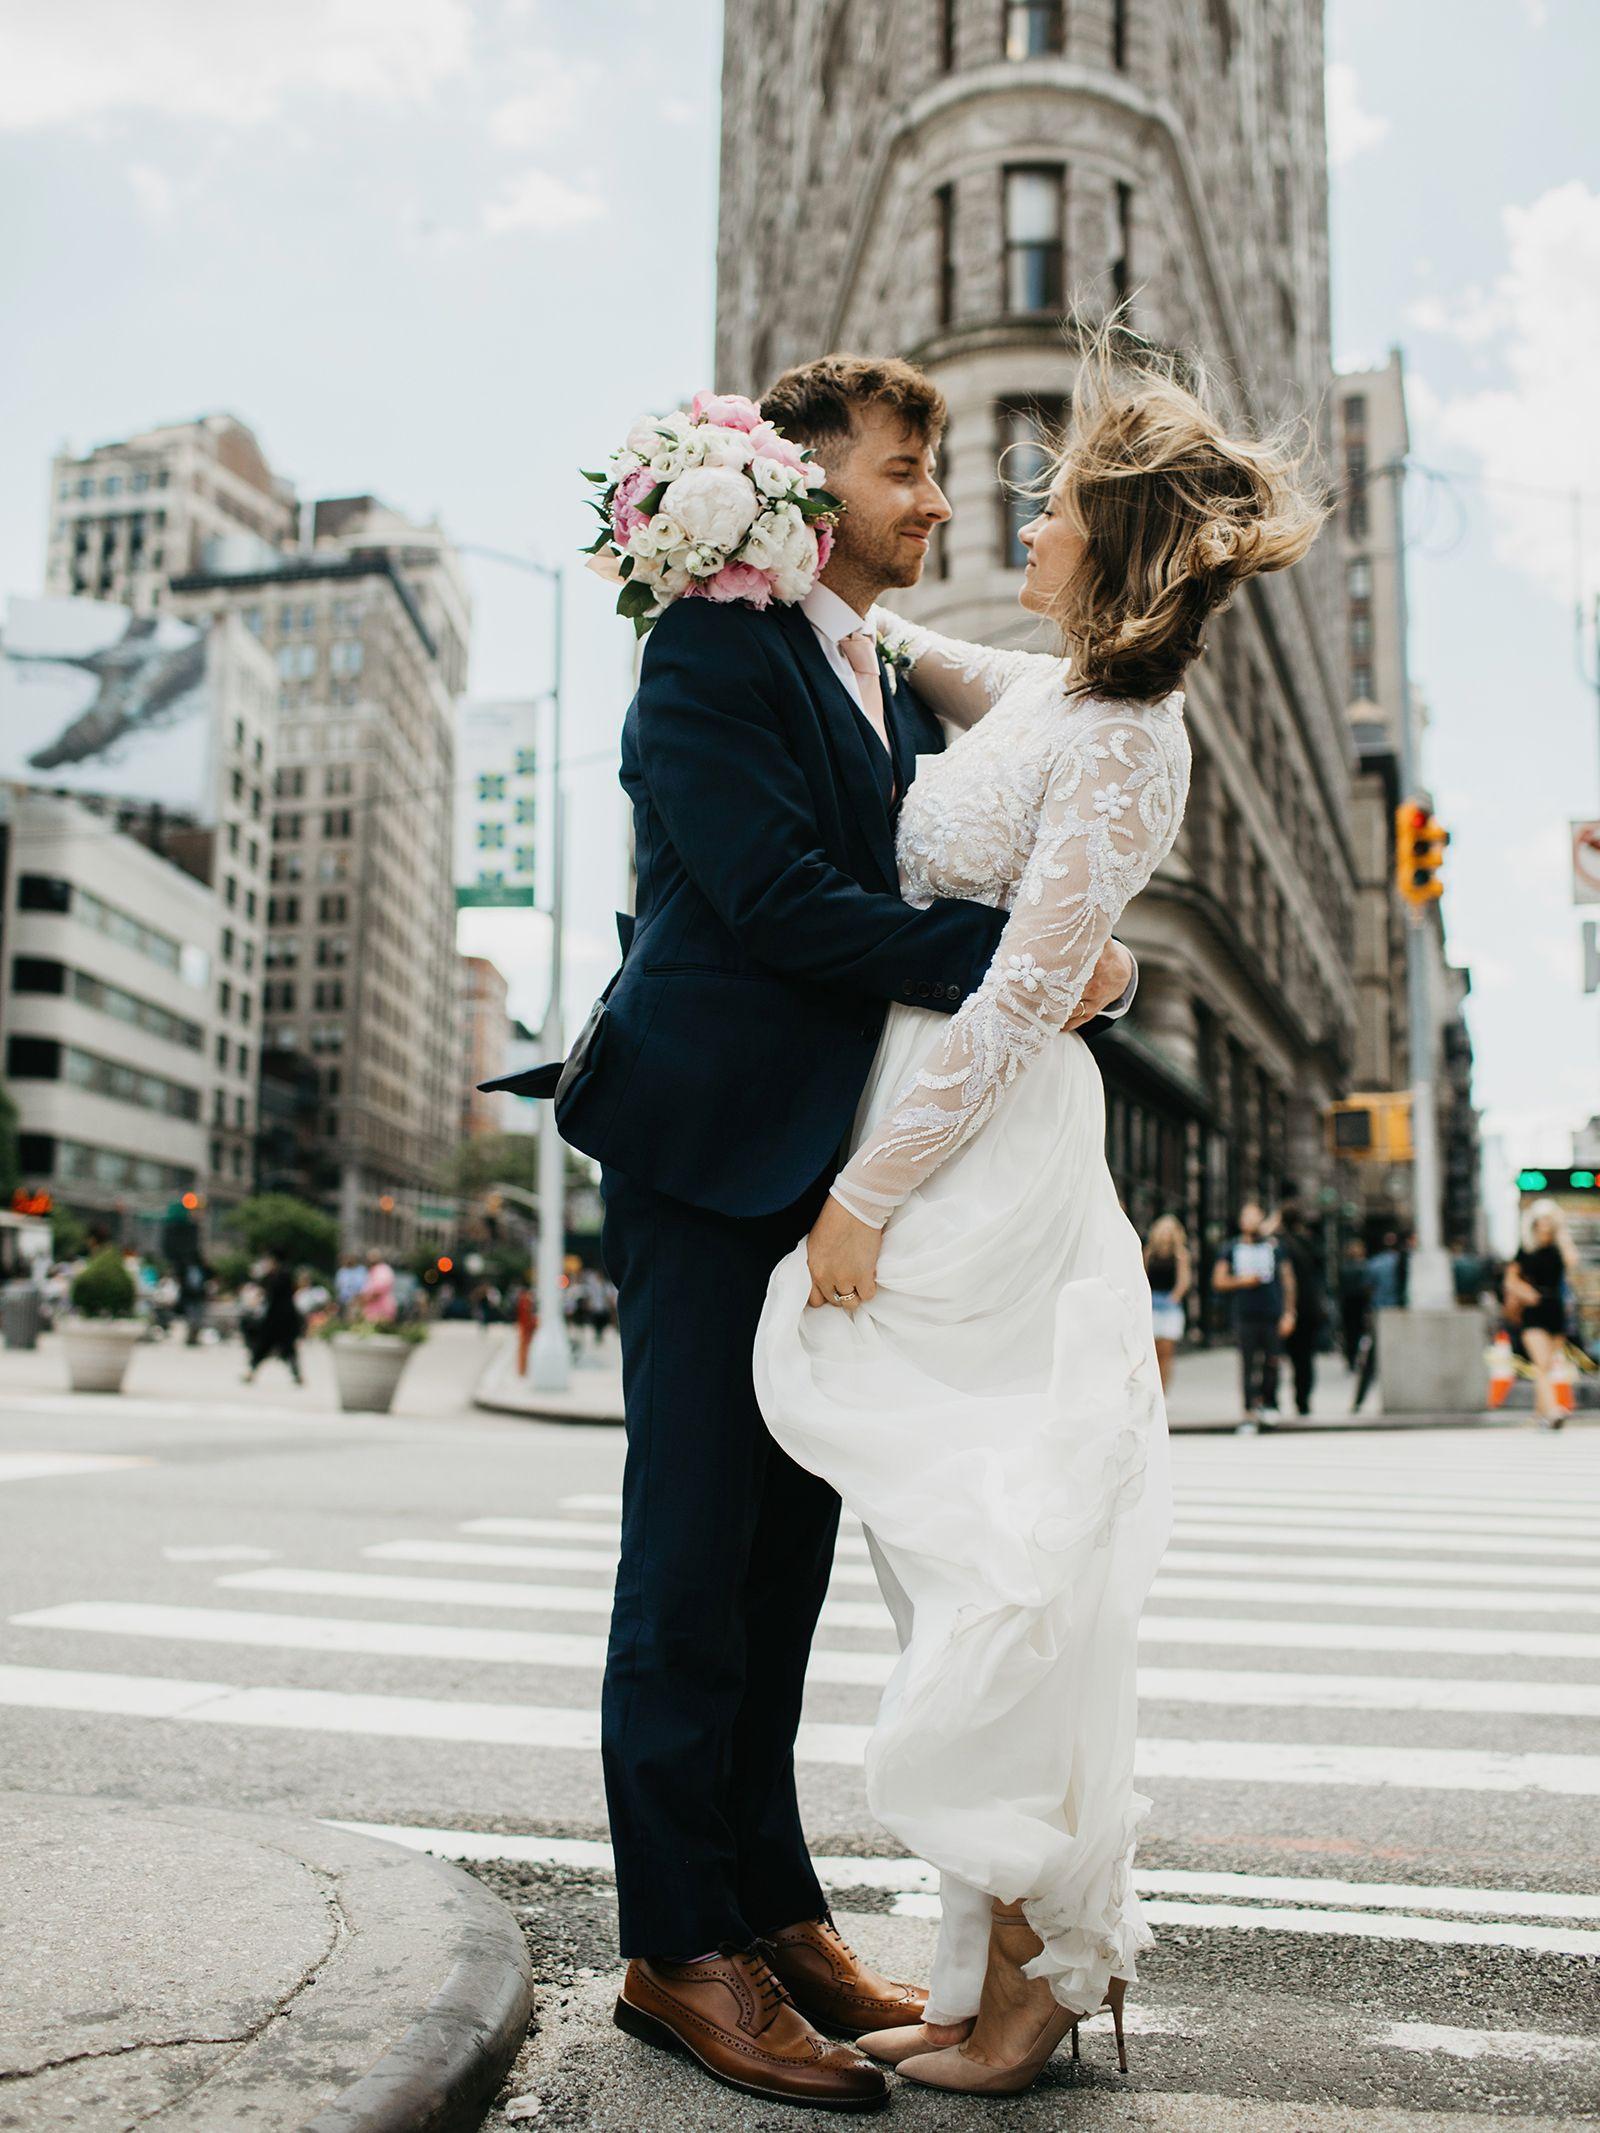 Our New York Wedding Kate La Vie New York Wedding Nyc Wedding Photos Nyc Wedding Photography